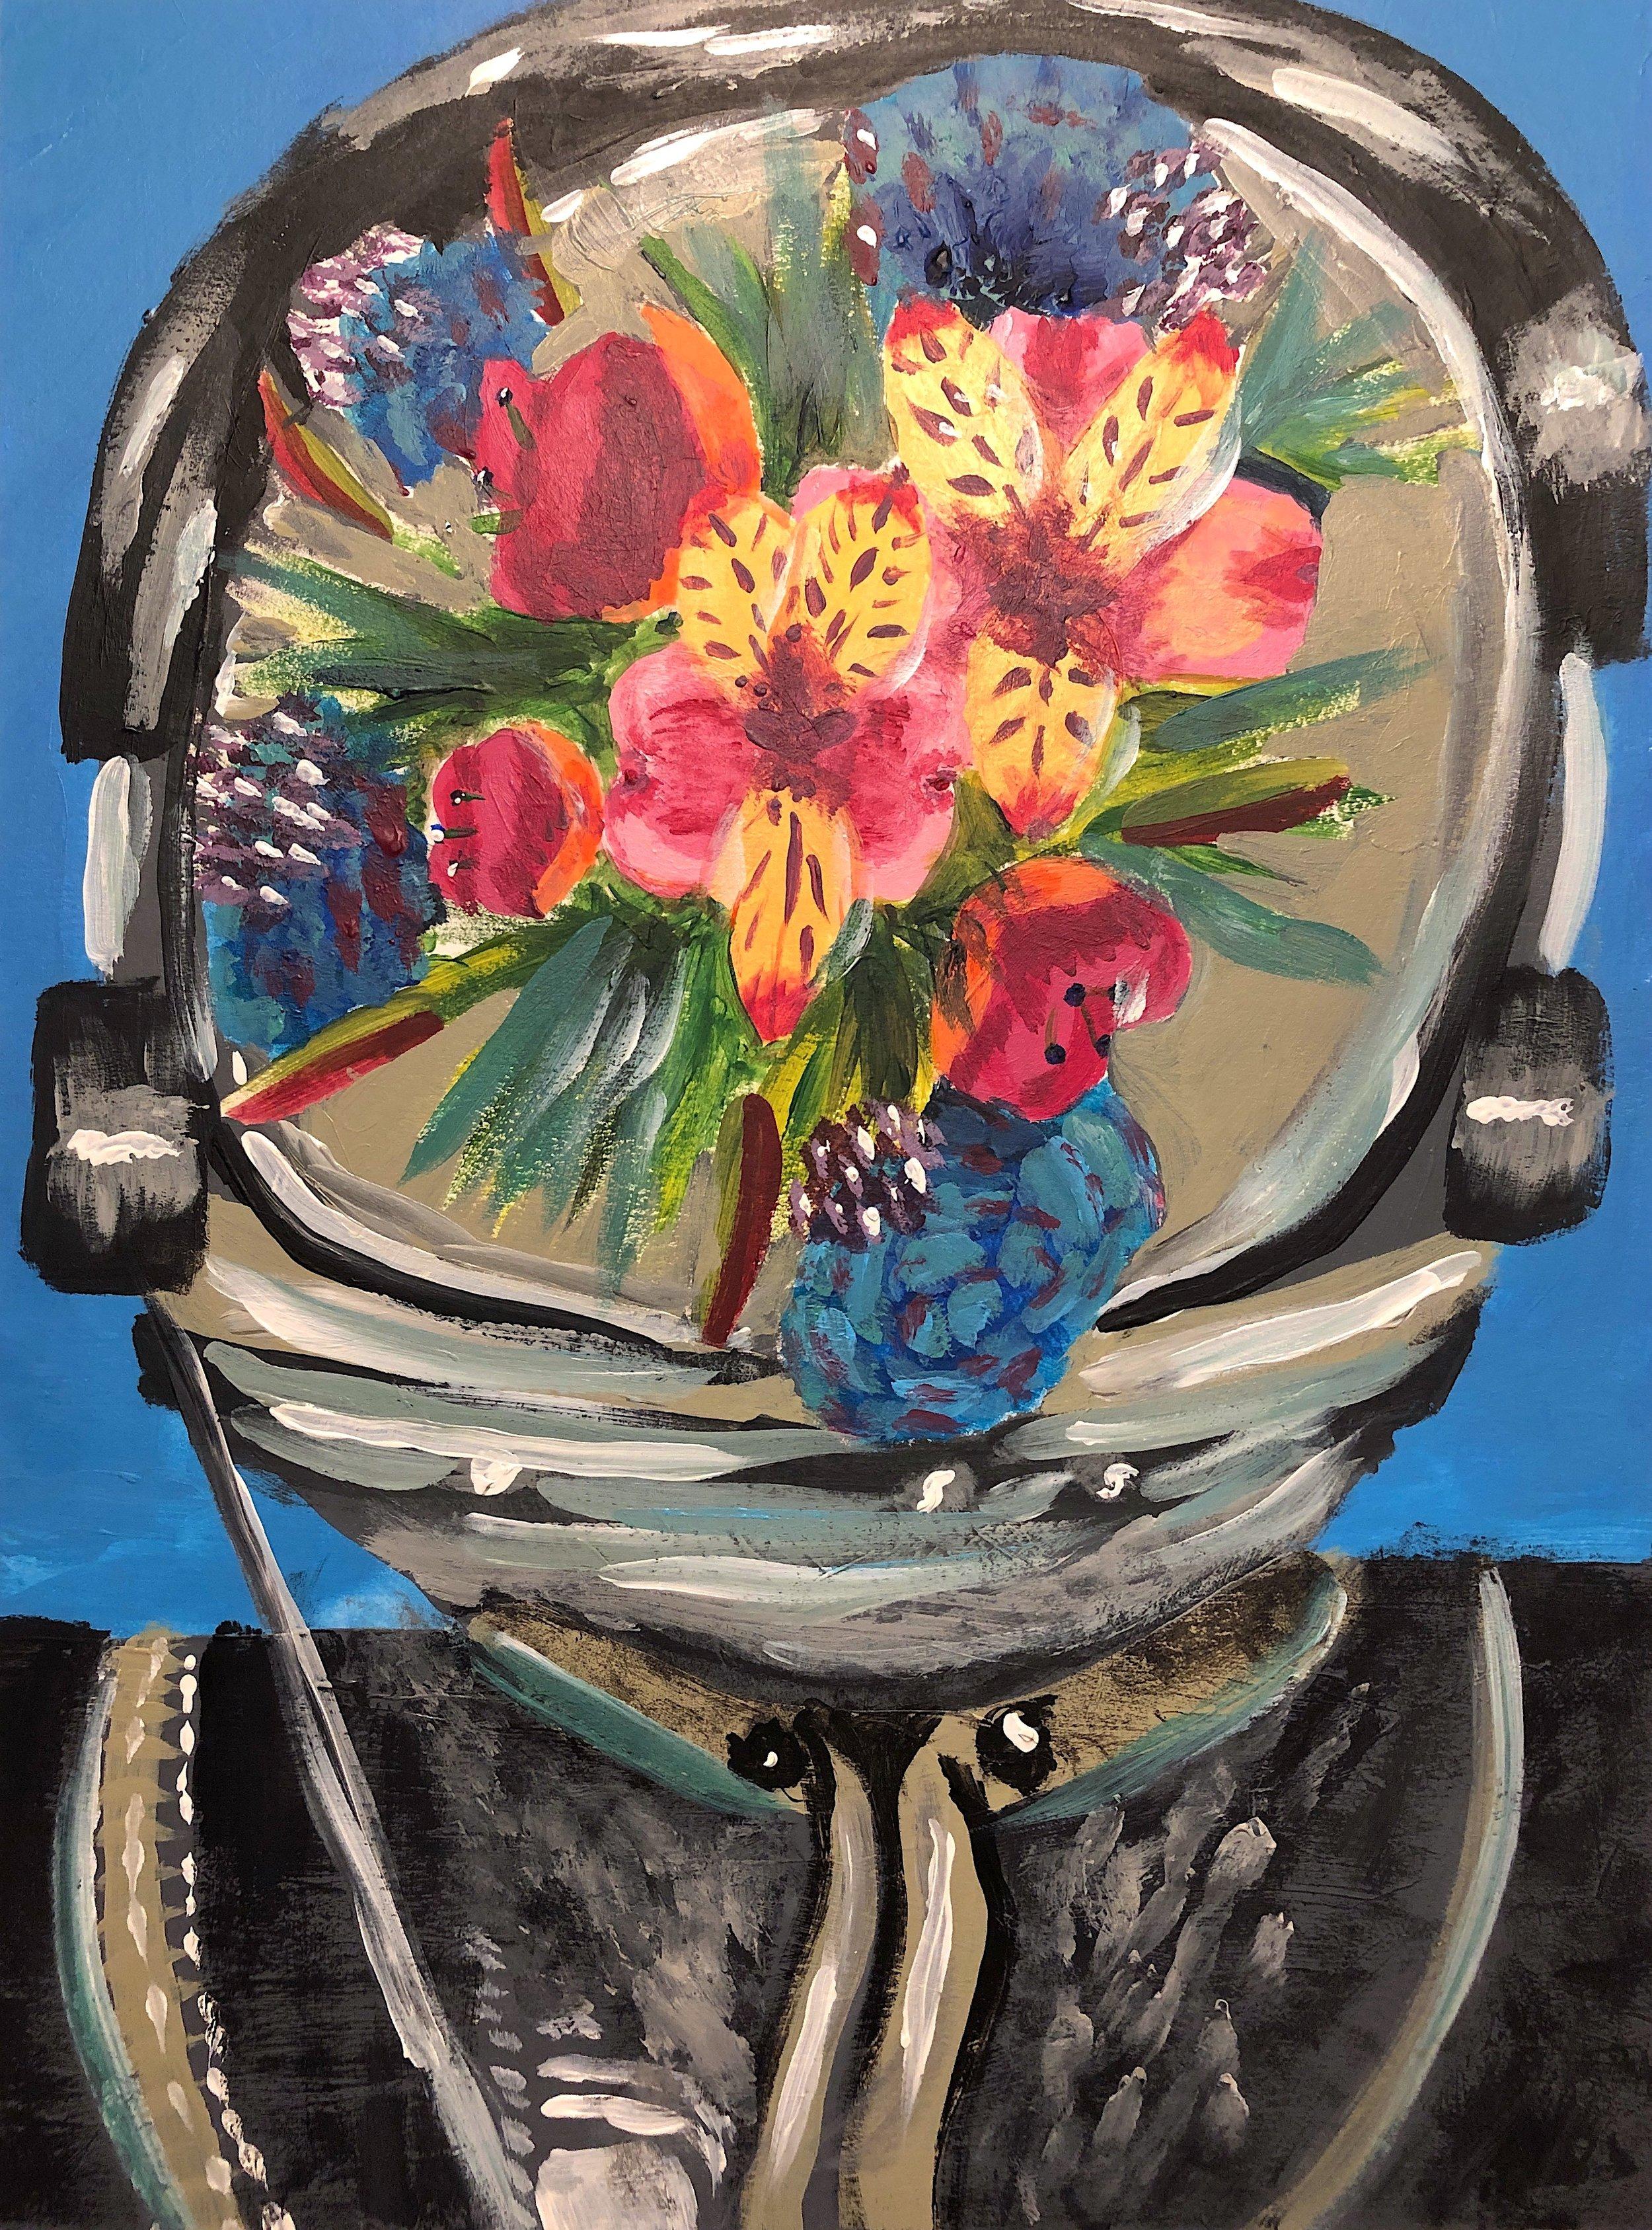 """Cosmonaut"" / Artwork by Katy Grubb"